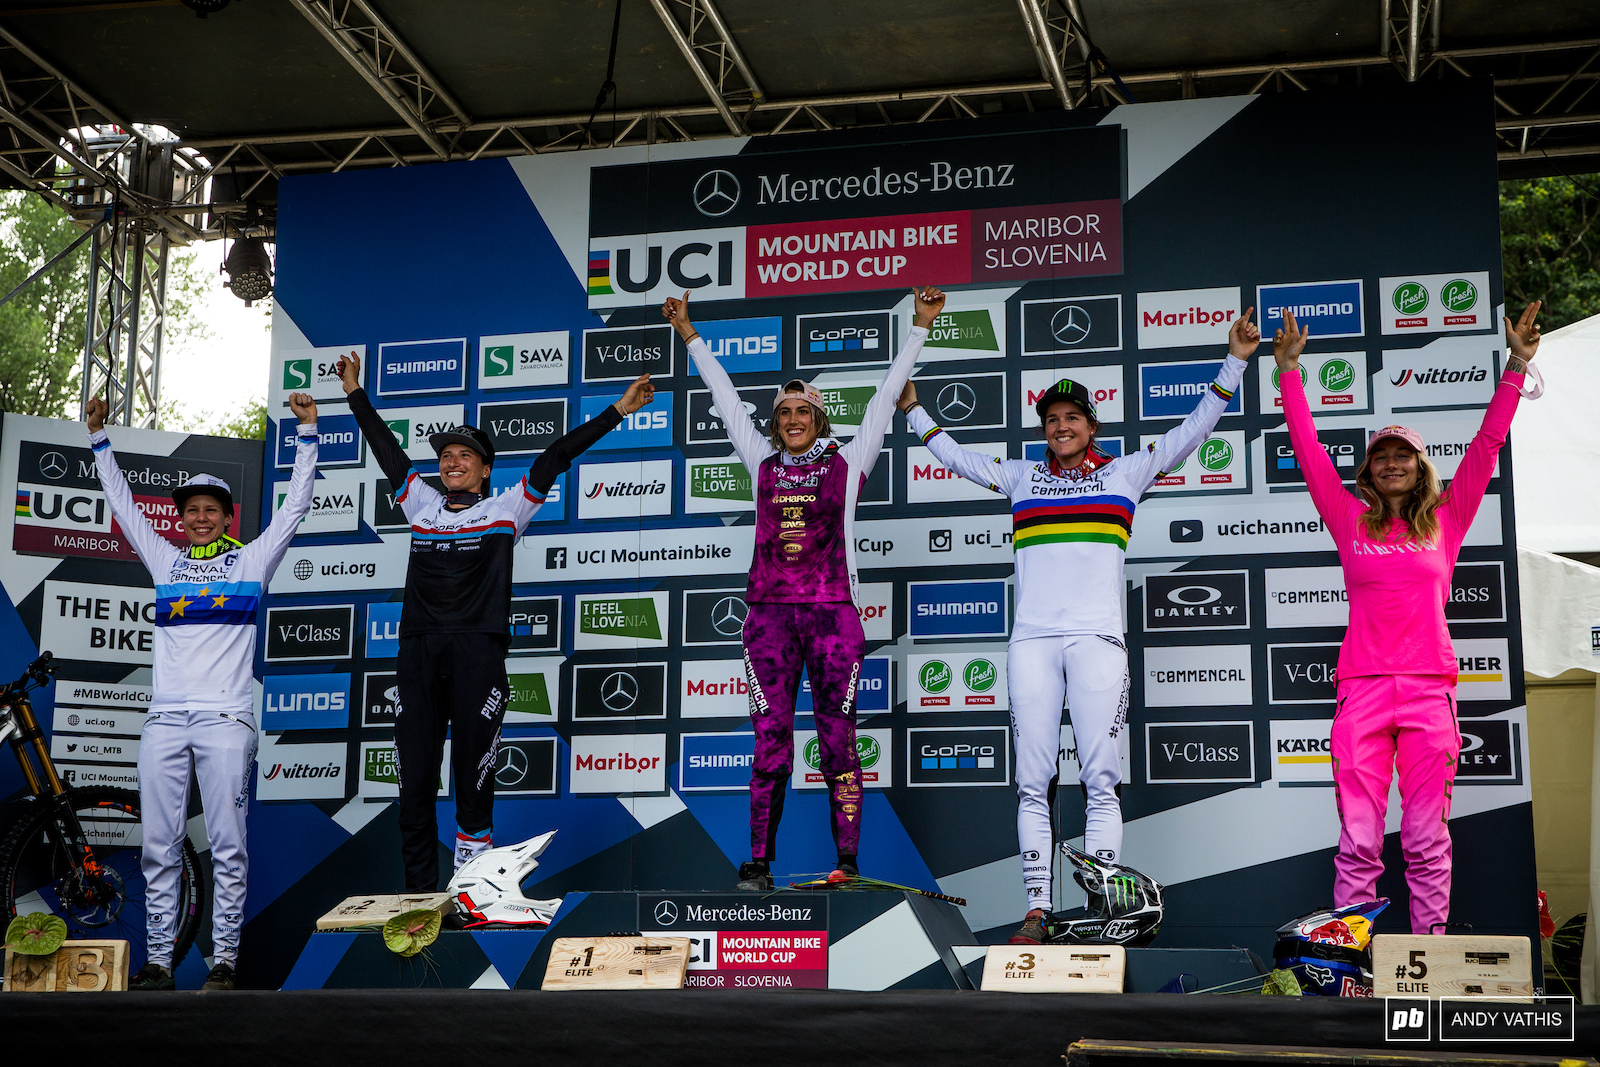 Your Women s Elite podium 1st Myriam Nicole 2nd Eleonora Farina 3rd Camille Balanche 4th Monika Hrastnik and 5th Tahnee Seagrave